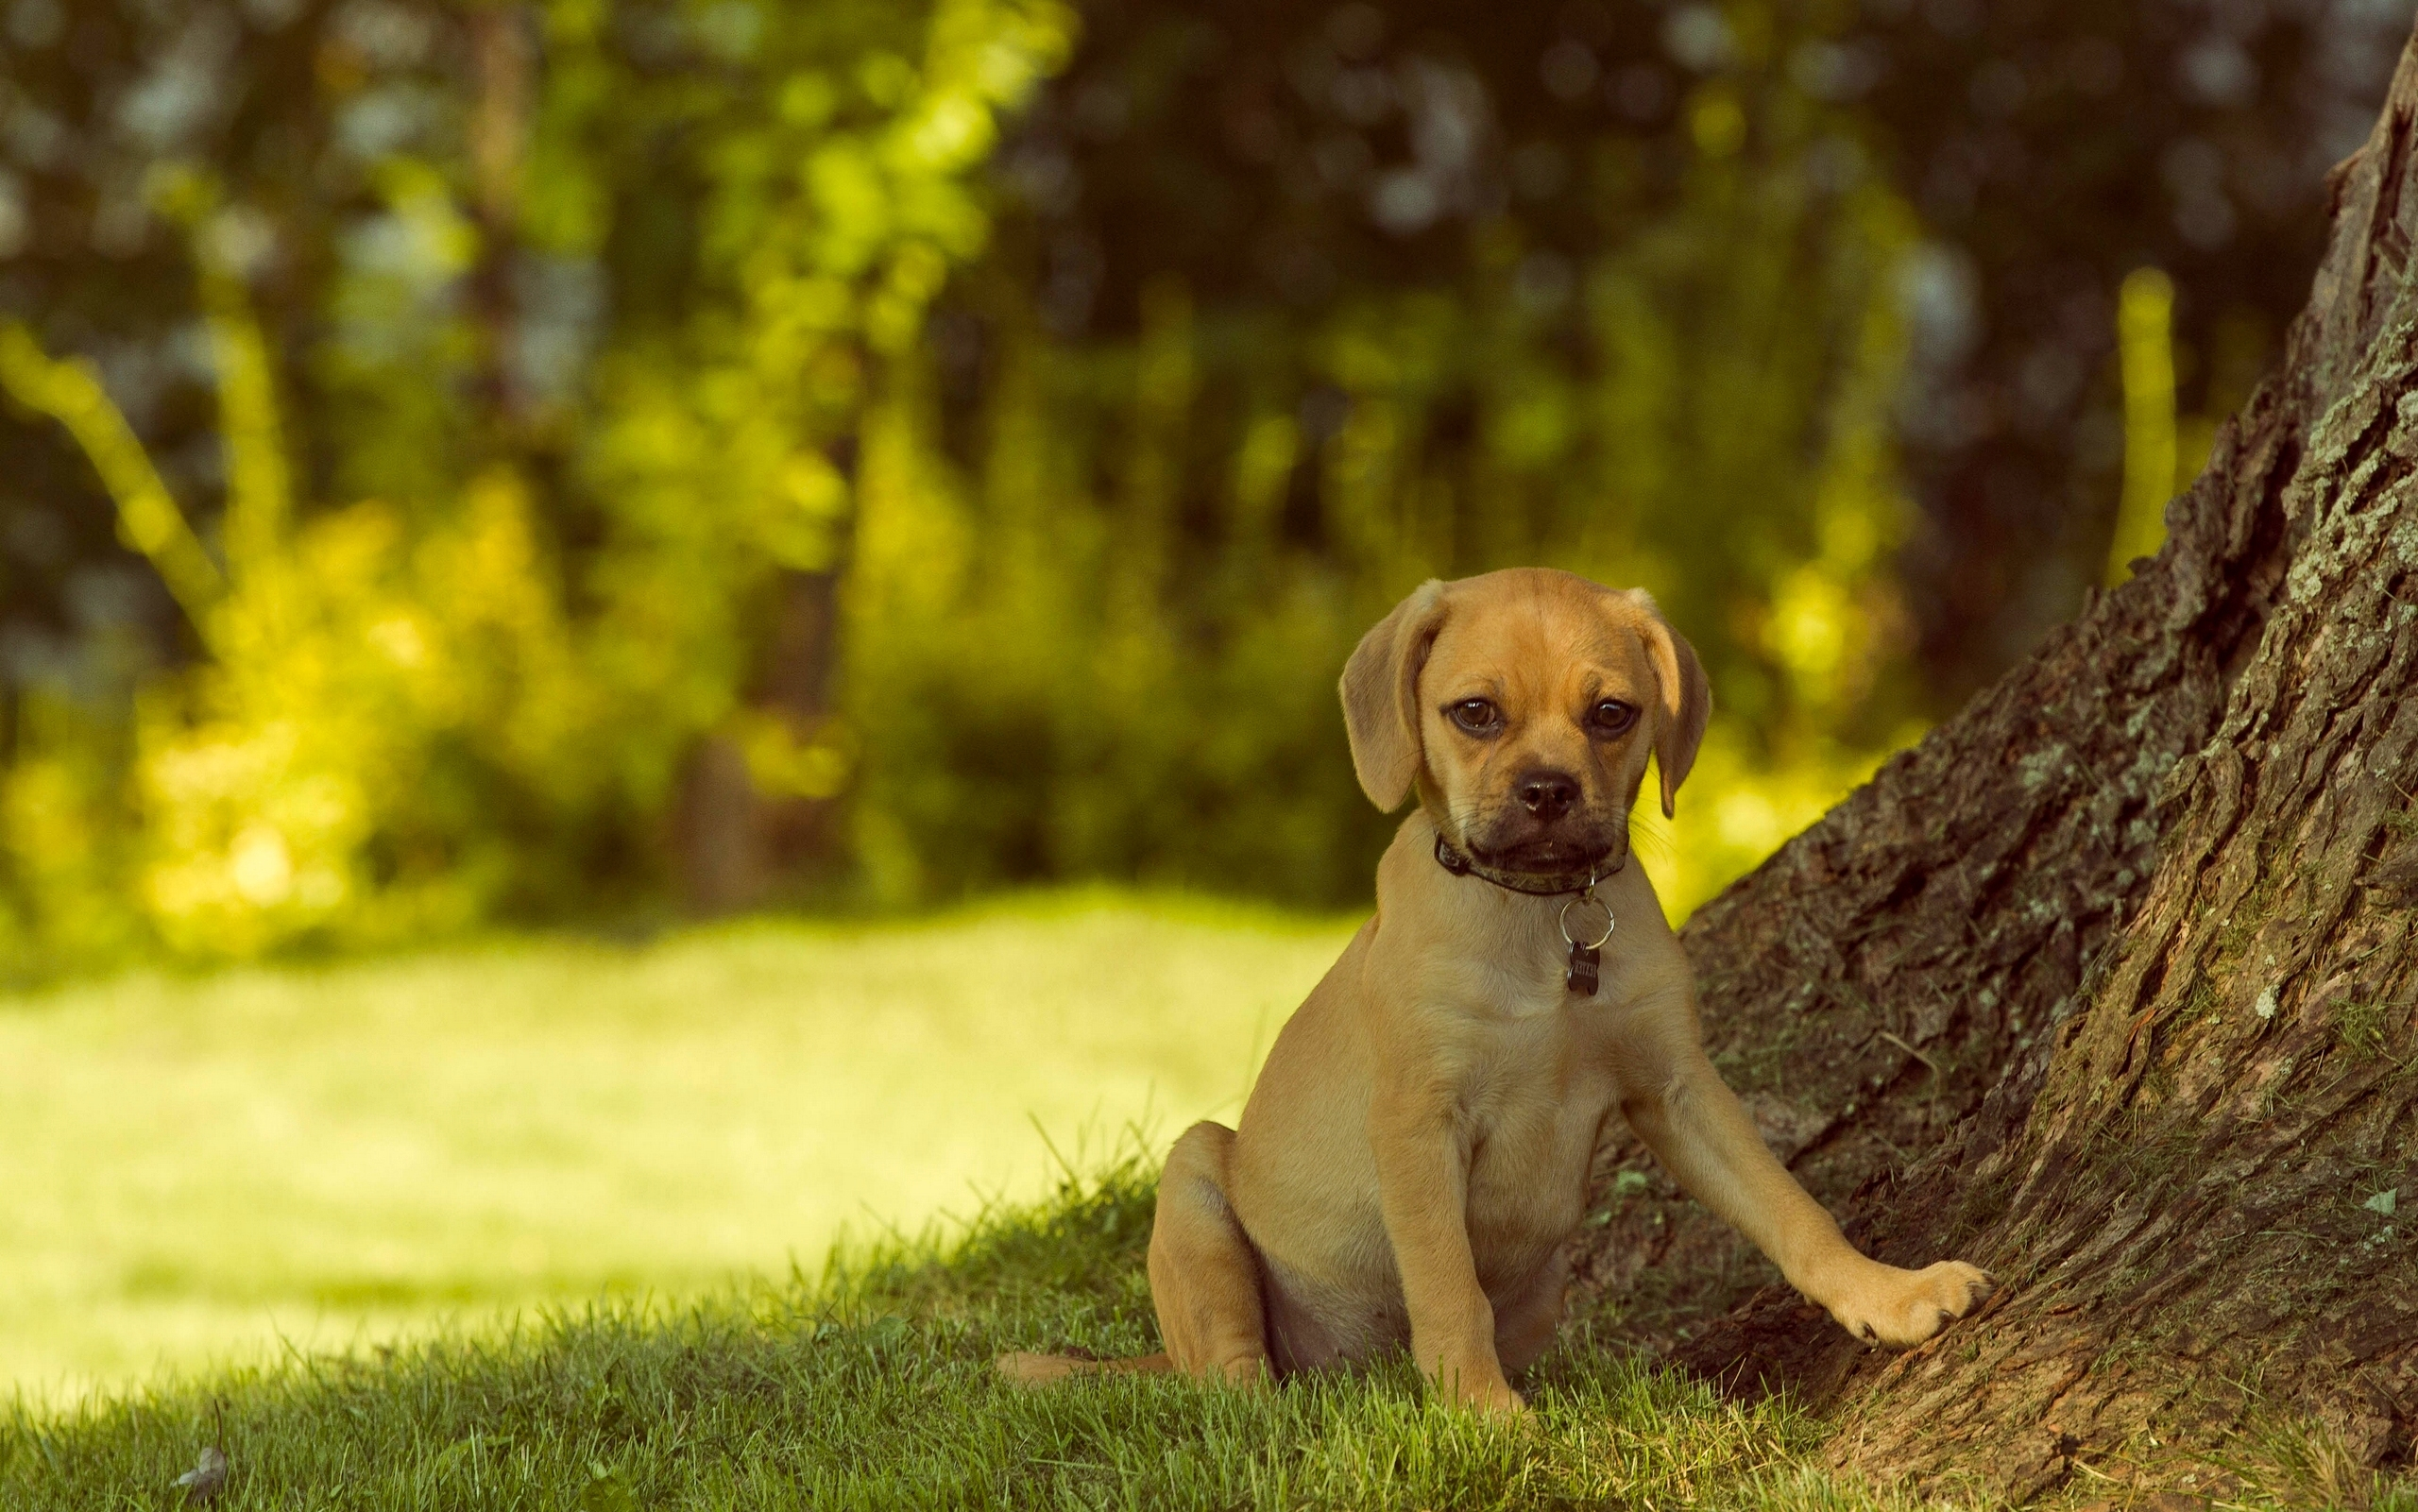 характер породы собаки пагль